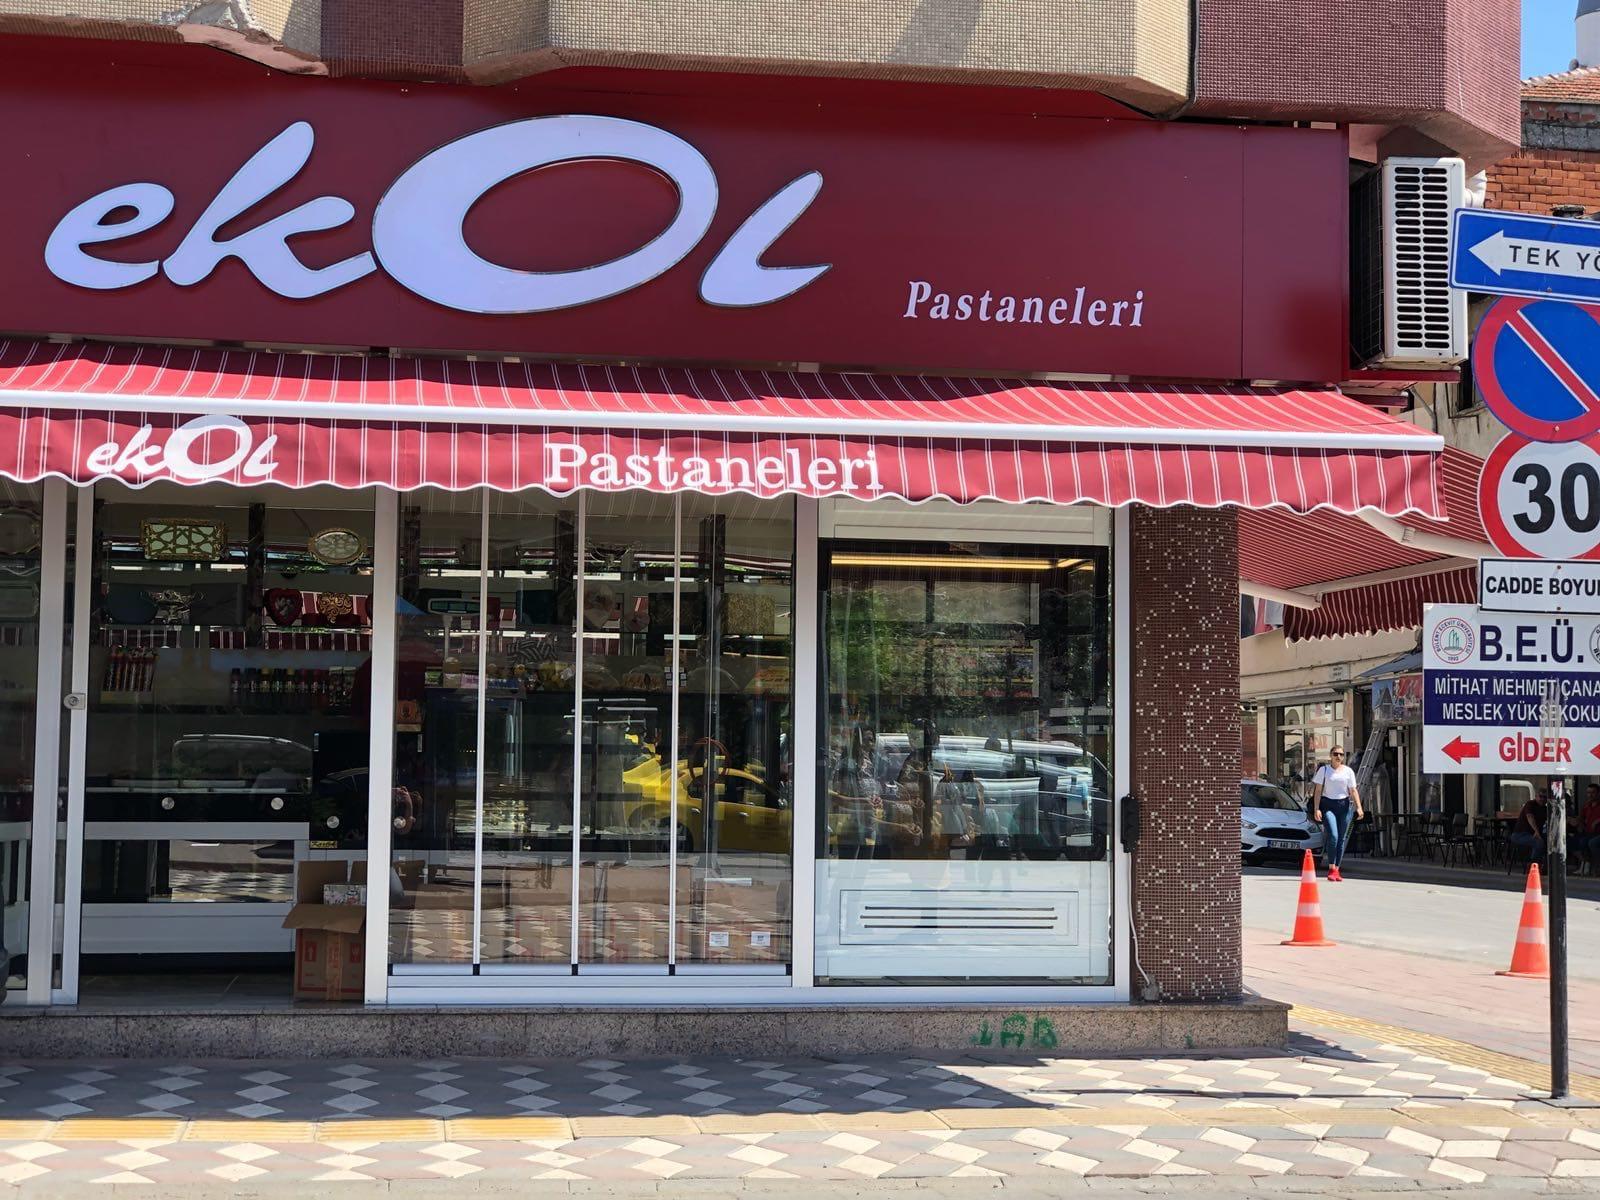 Ekol Pastaneleri Cafe&Restaurant